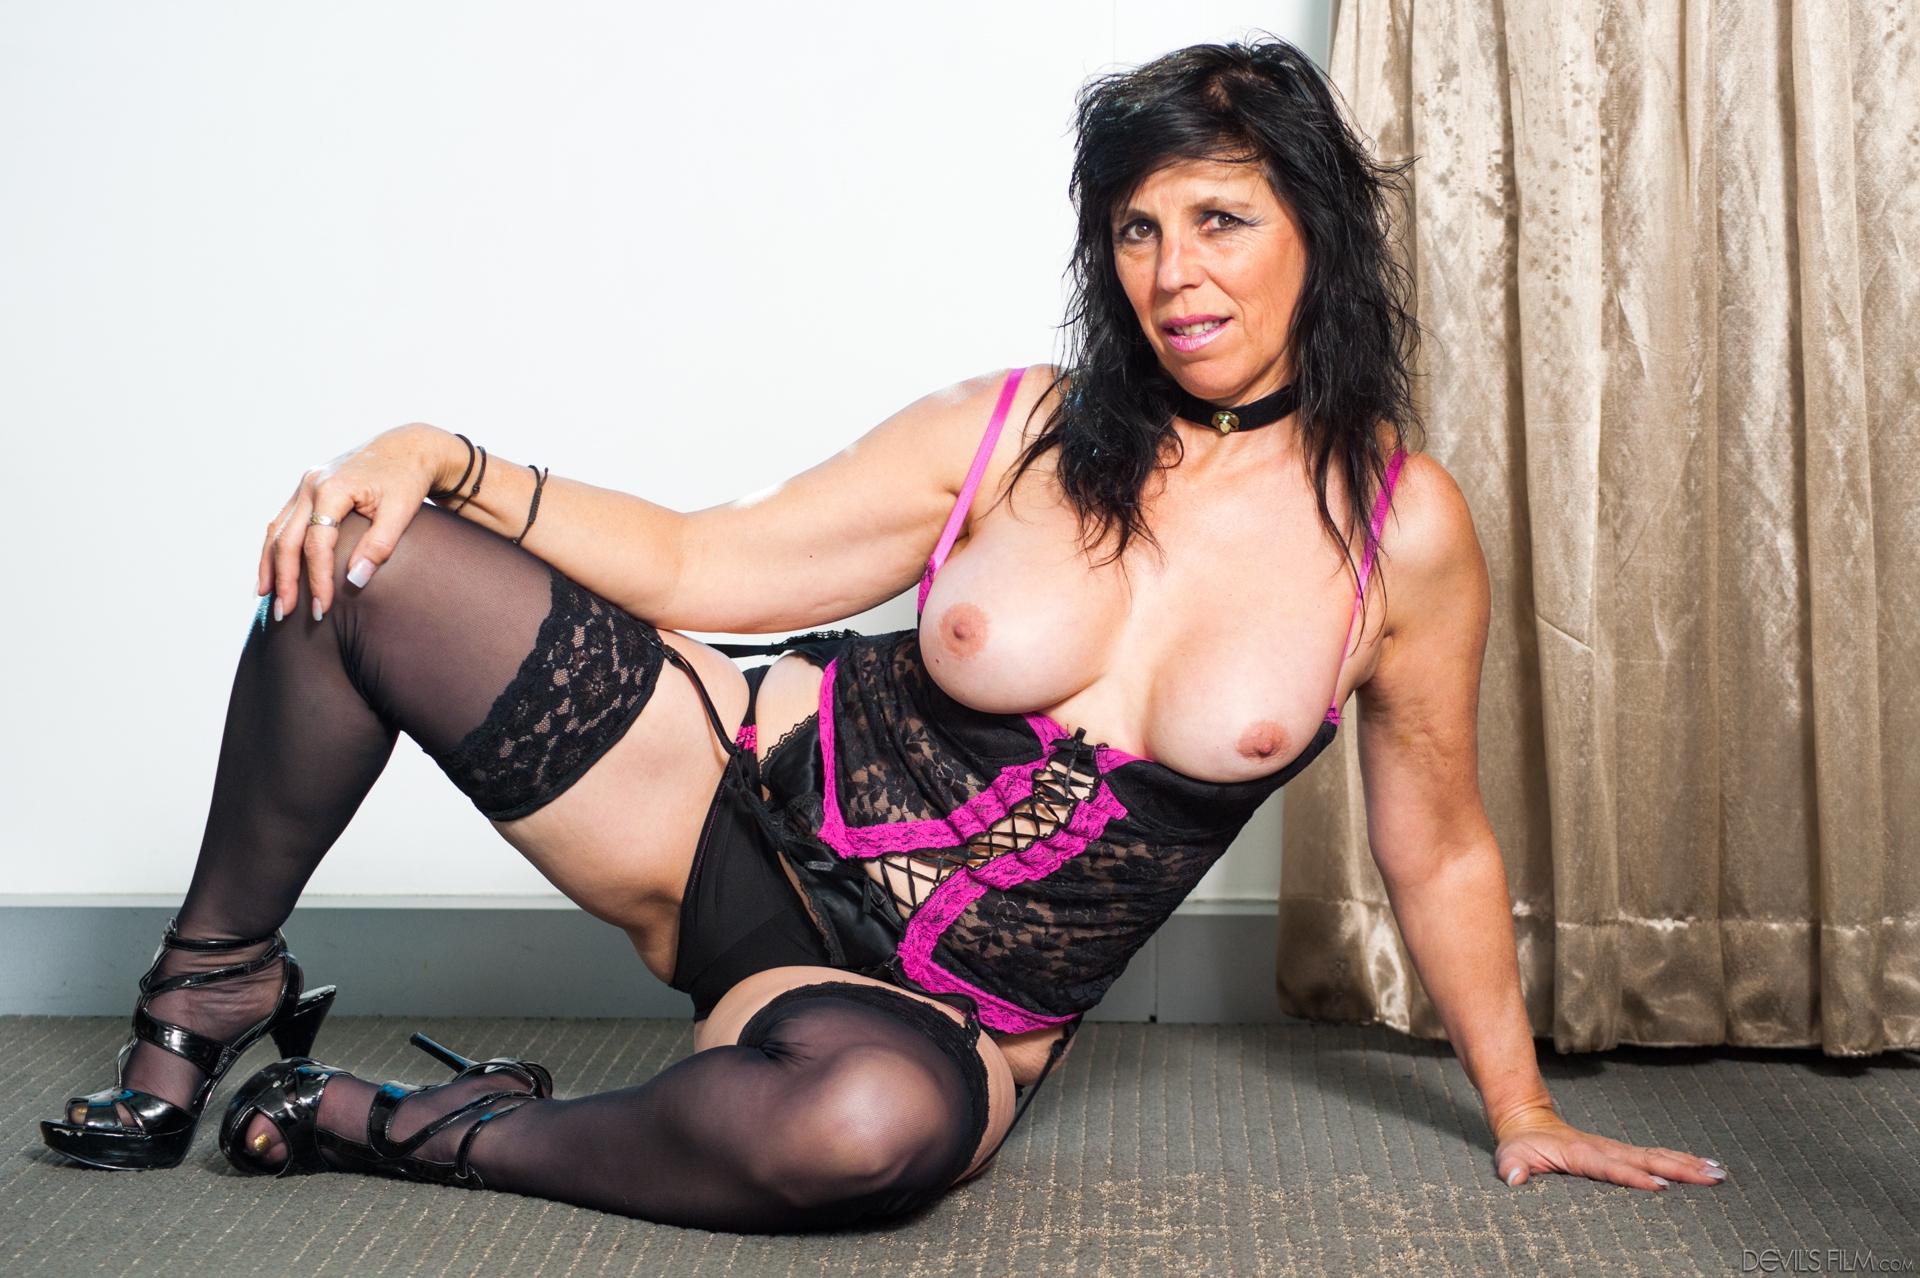 Todays update – raven flight granny fuck, oma pulls her lingerie to seduce her stepsun